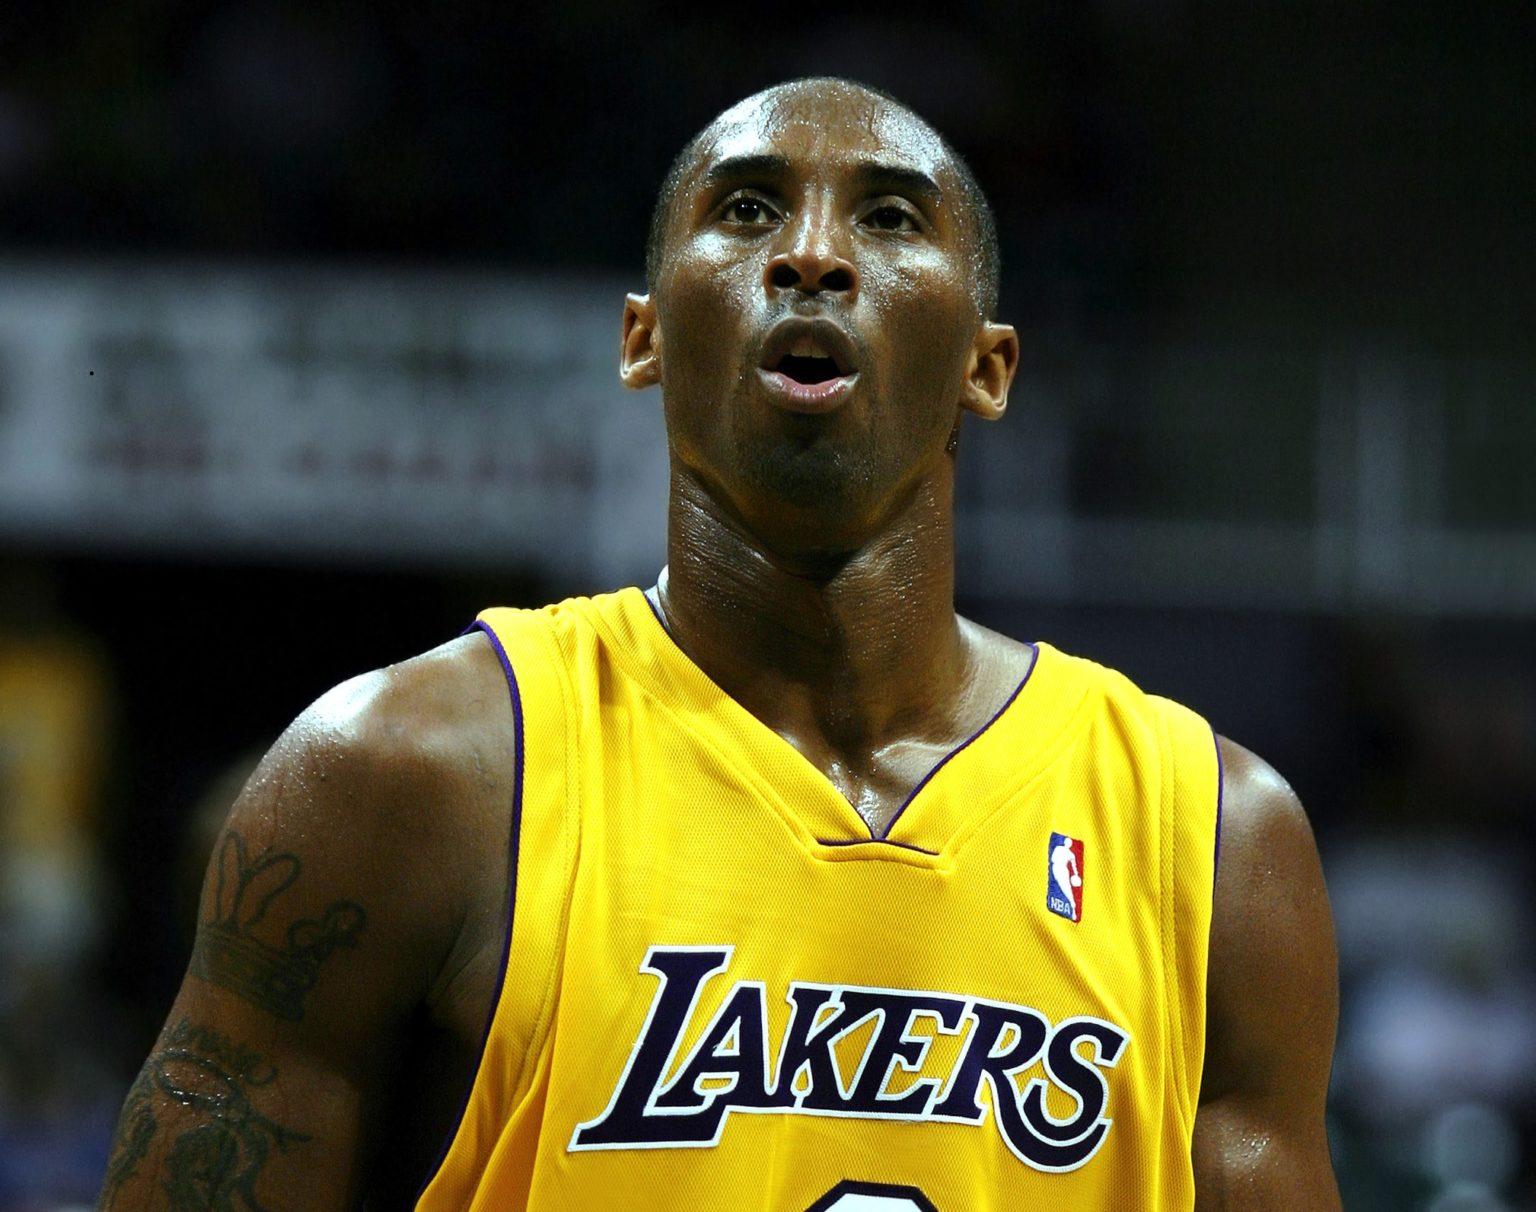 Tim Cook tweets condolences on death of Kobe Bryant